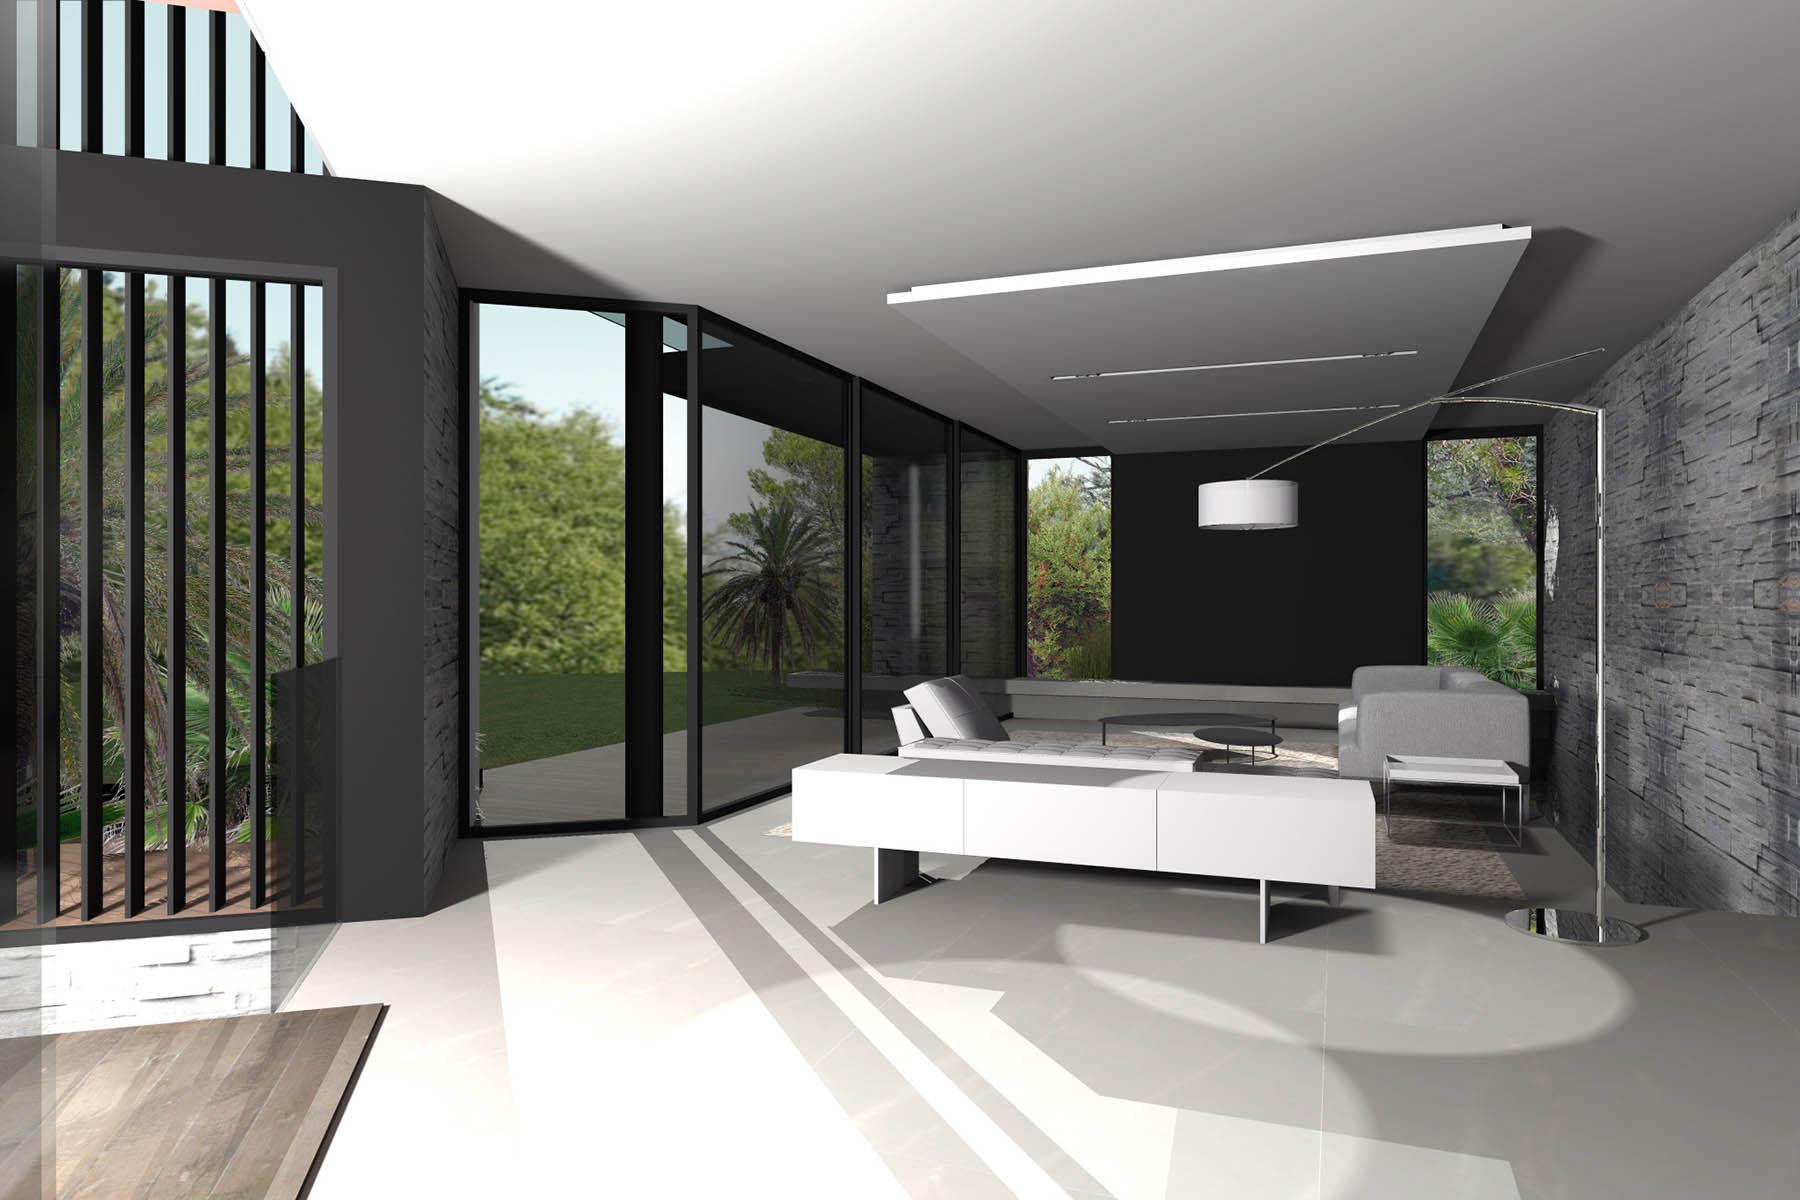 villa j aix en provence fr togu architecture. Black Bedroom Furniture Sets. Home Design Ideas